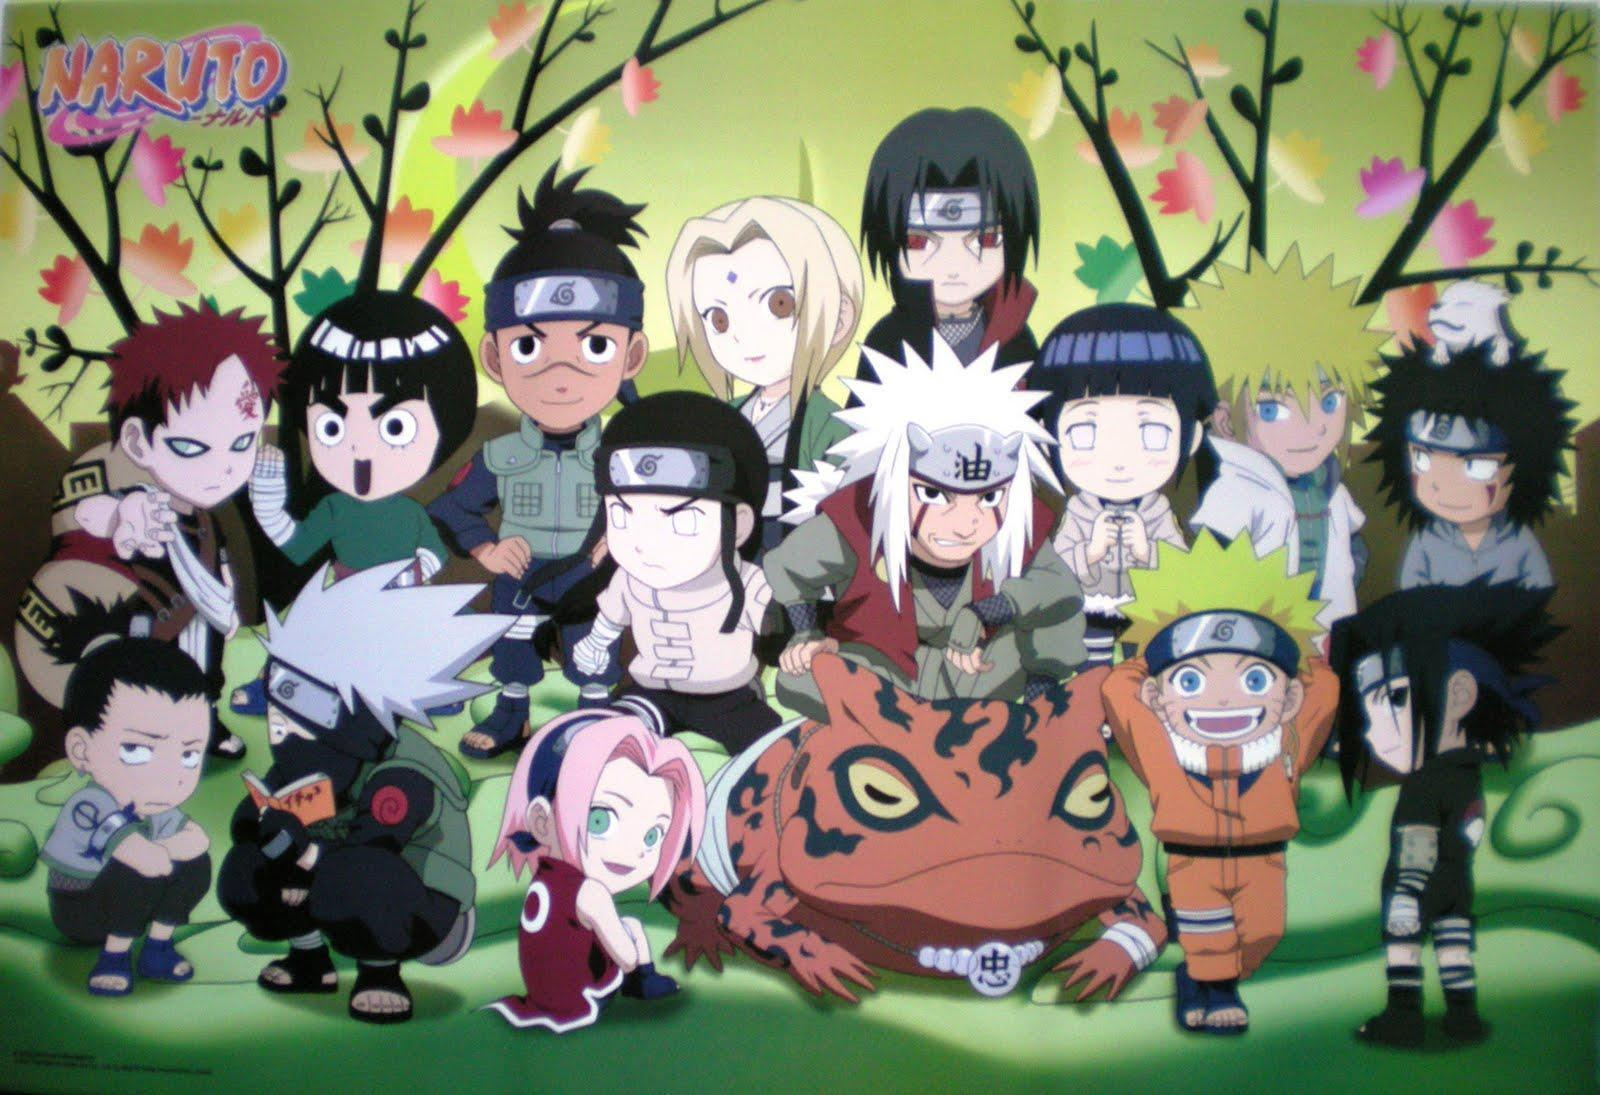 Naruto Chibi Wallpapers Top Free Naruto Chibi Backgrounds Wallpaperaccess